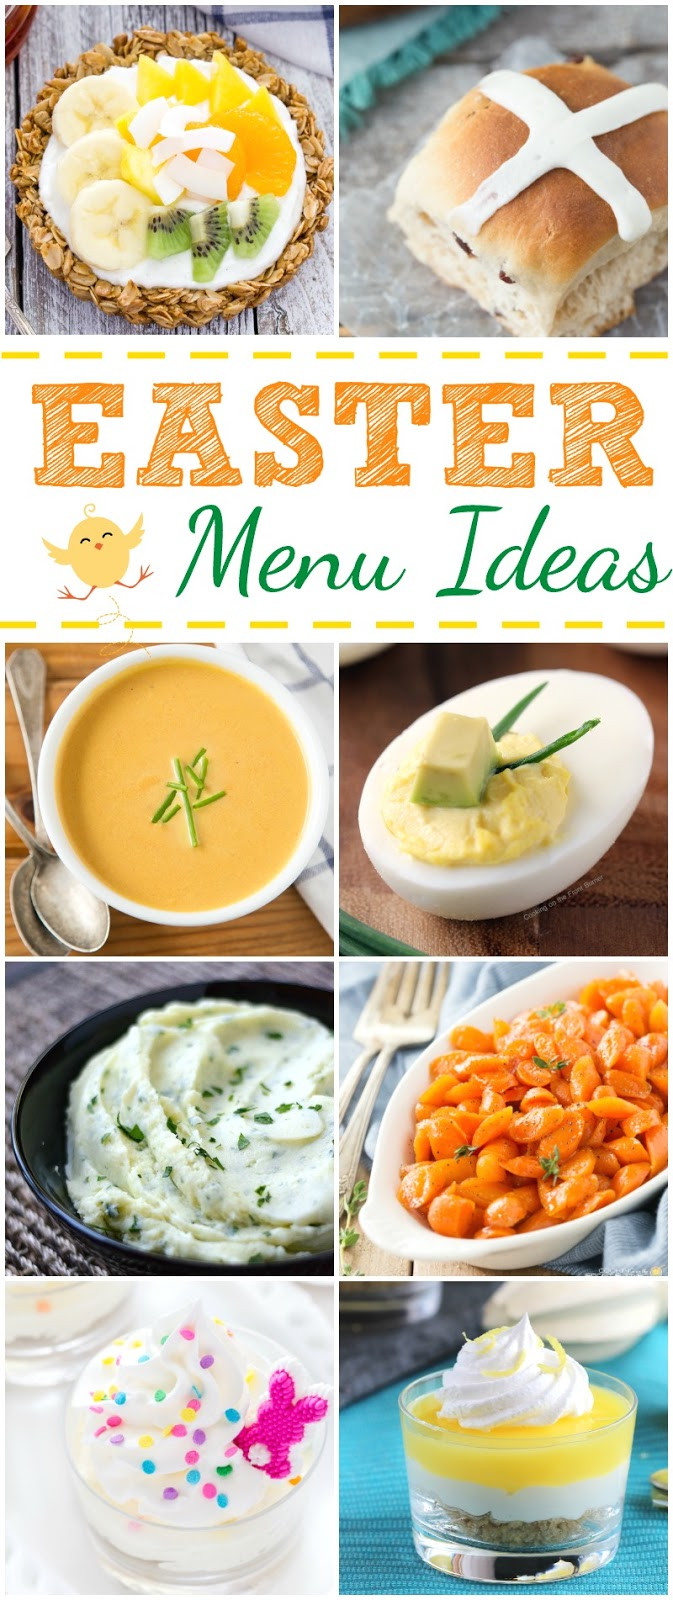 Easter Dinner Menus Ideas the top 20 Ideas About Easter Menu Ideas